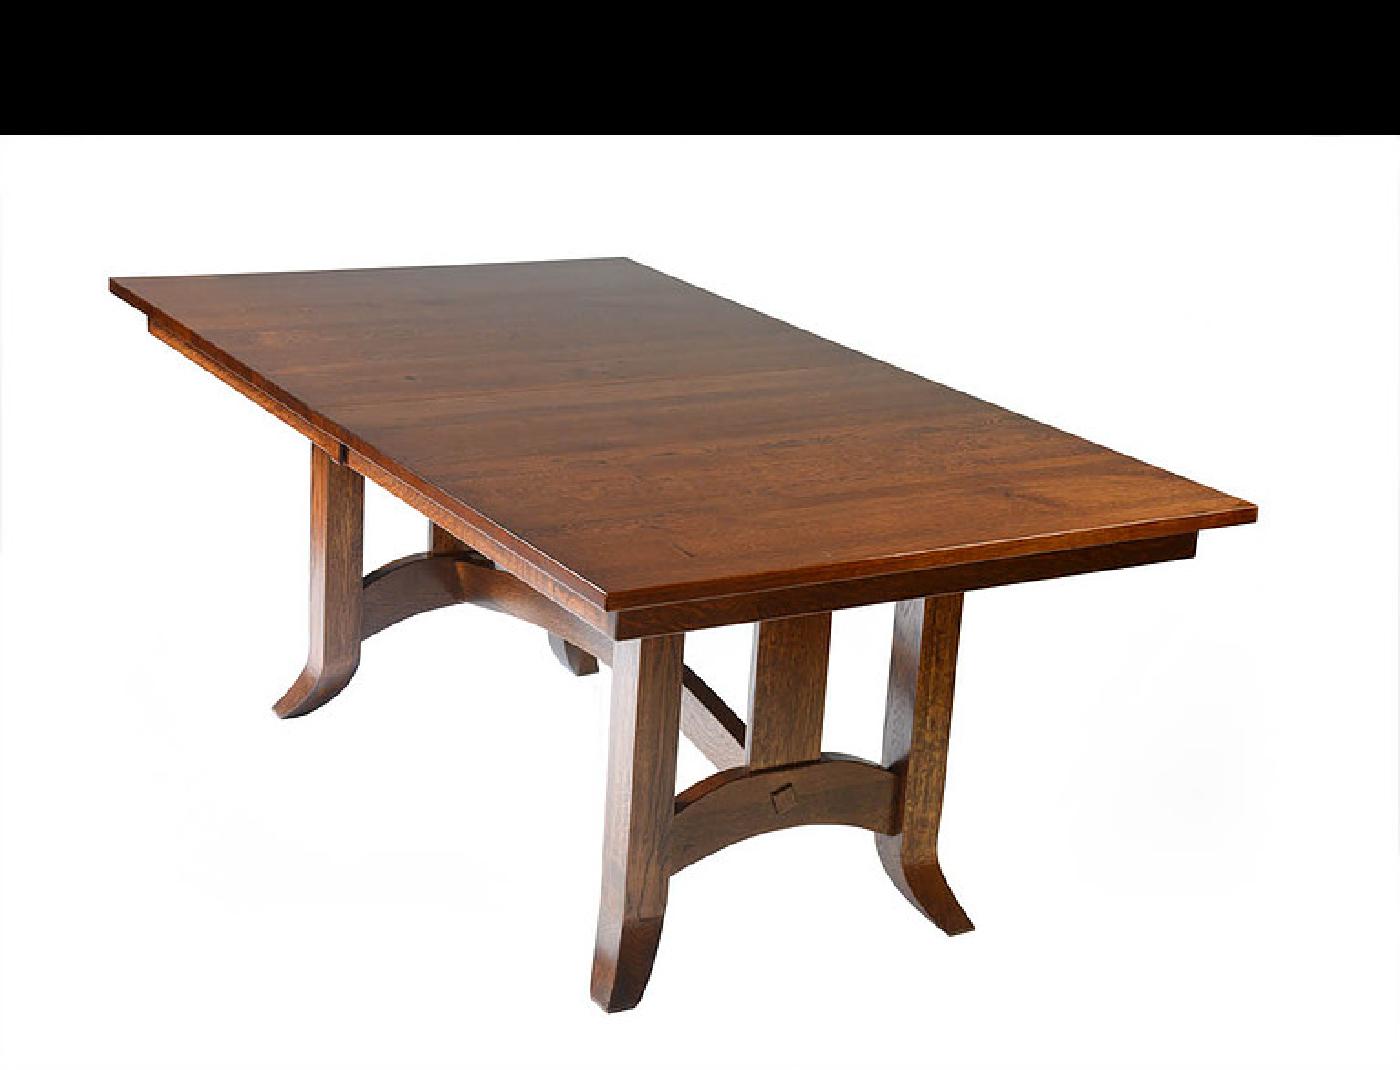 Shaker Trestle Table Amish Furniture Of Austin